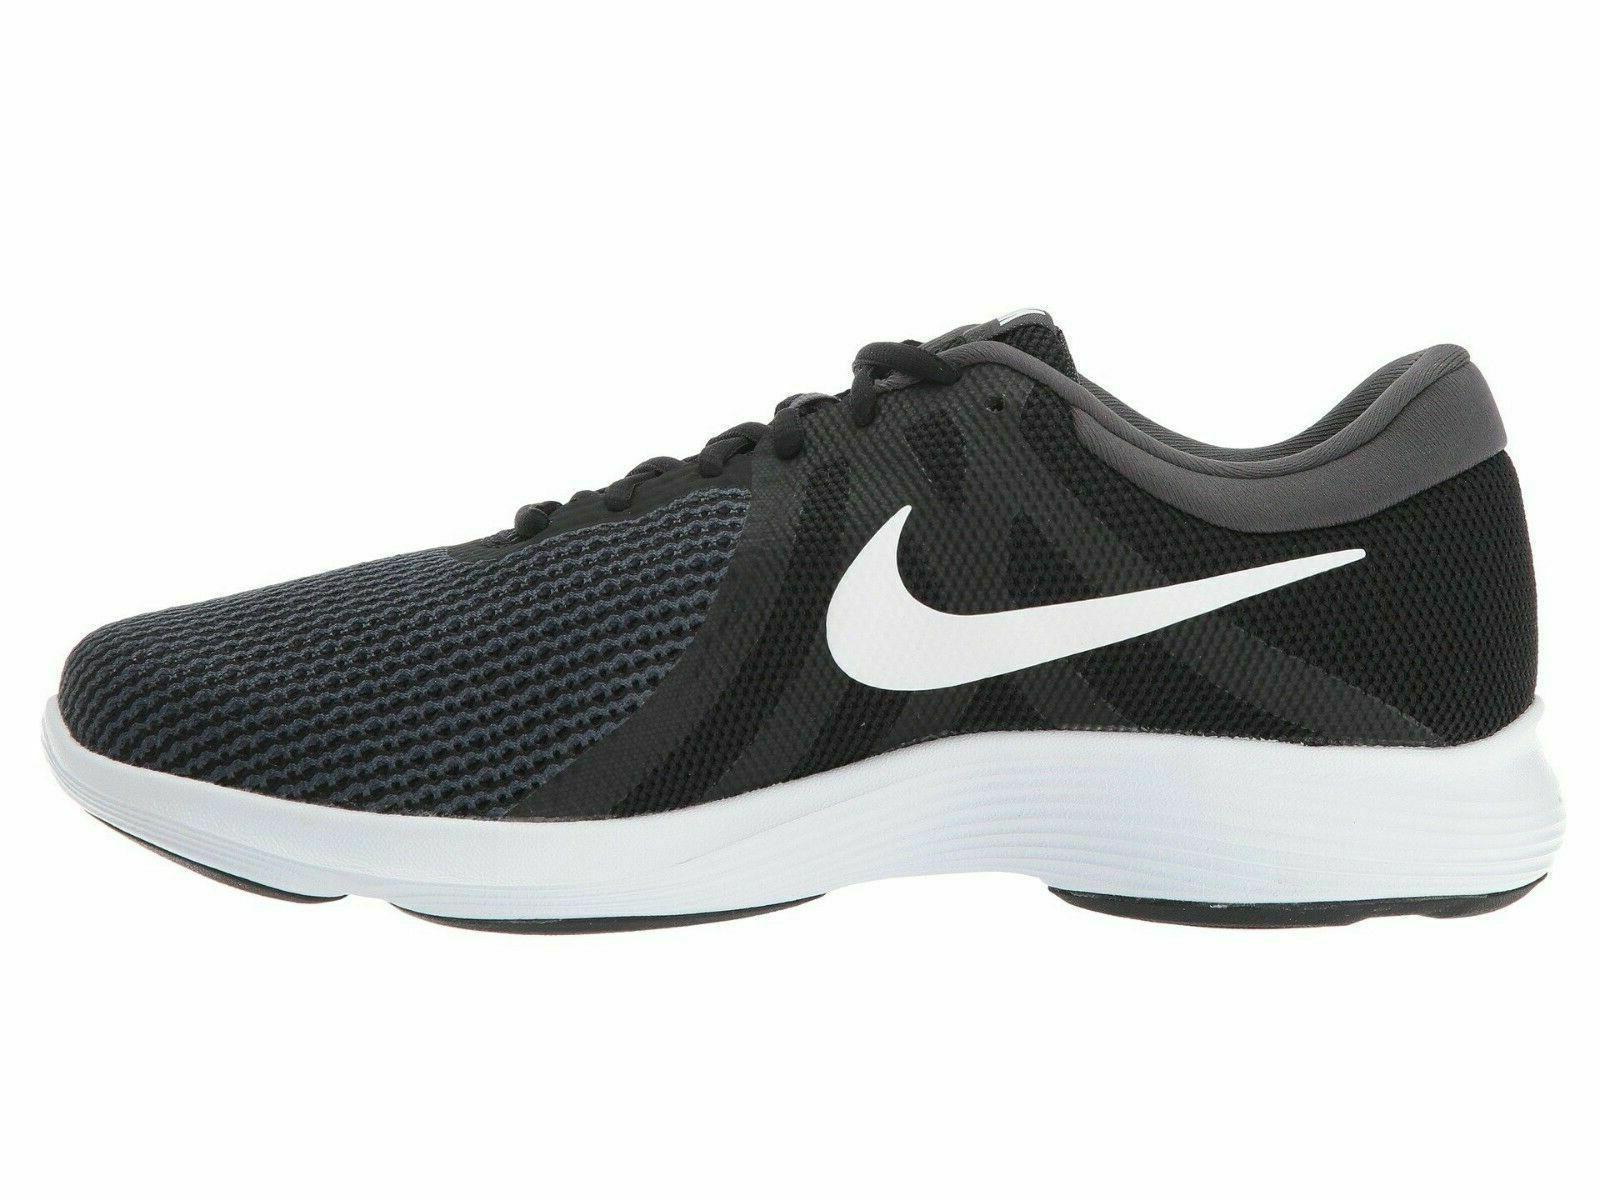 Nike Shoes Black 908988-001 NEW